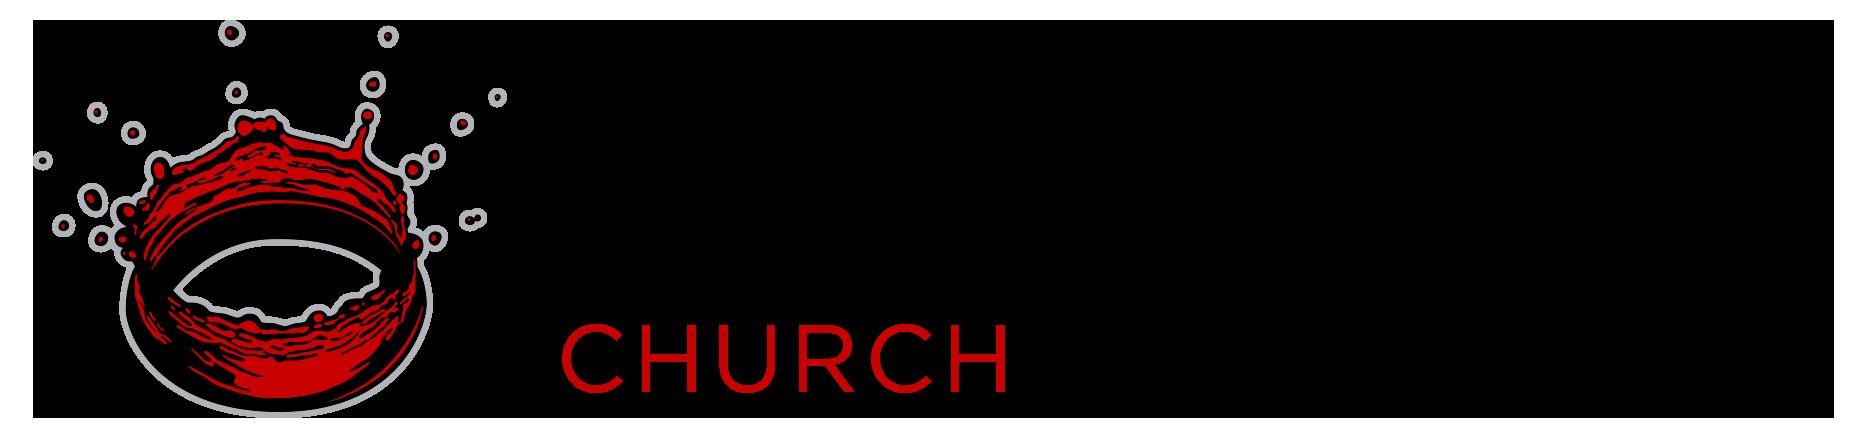 impactrock_logo_color.png